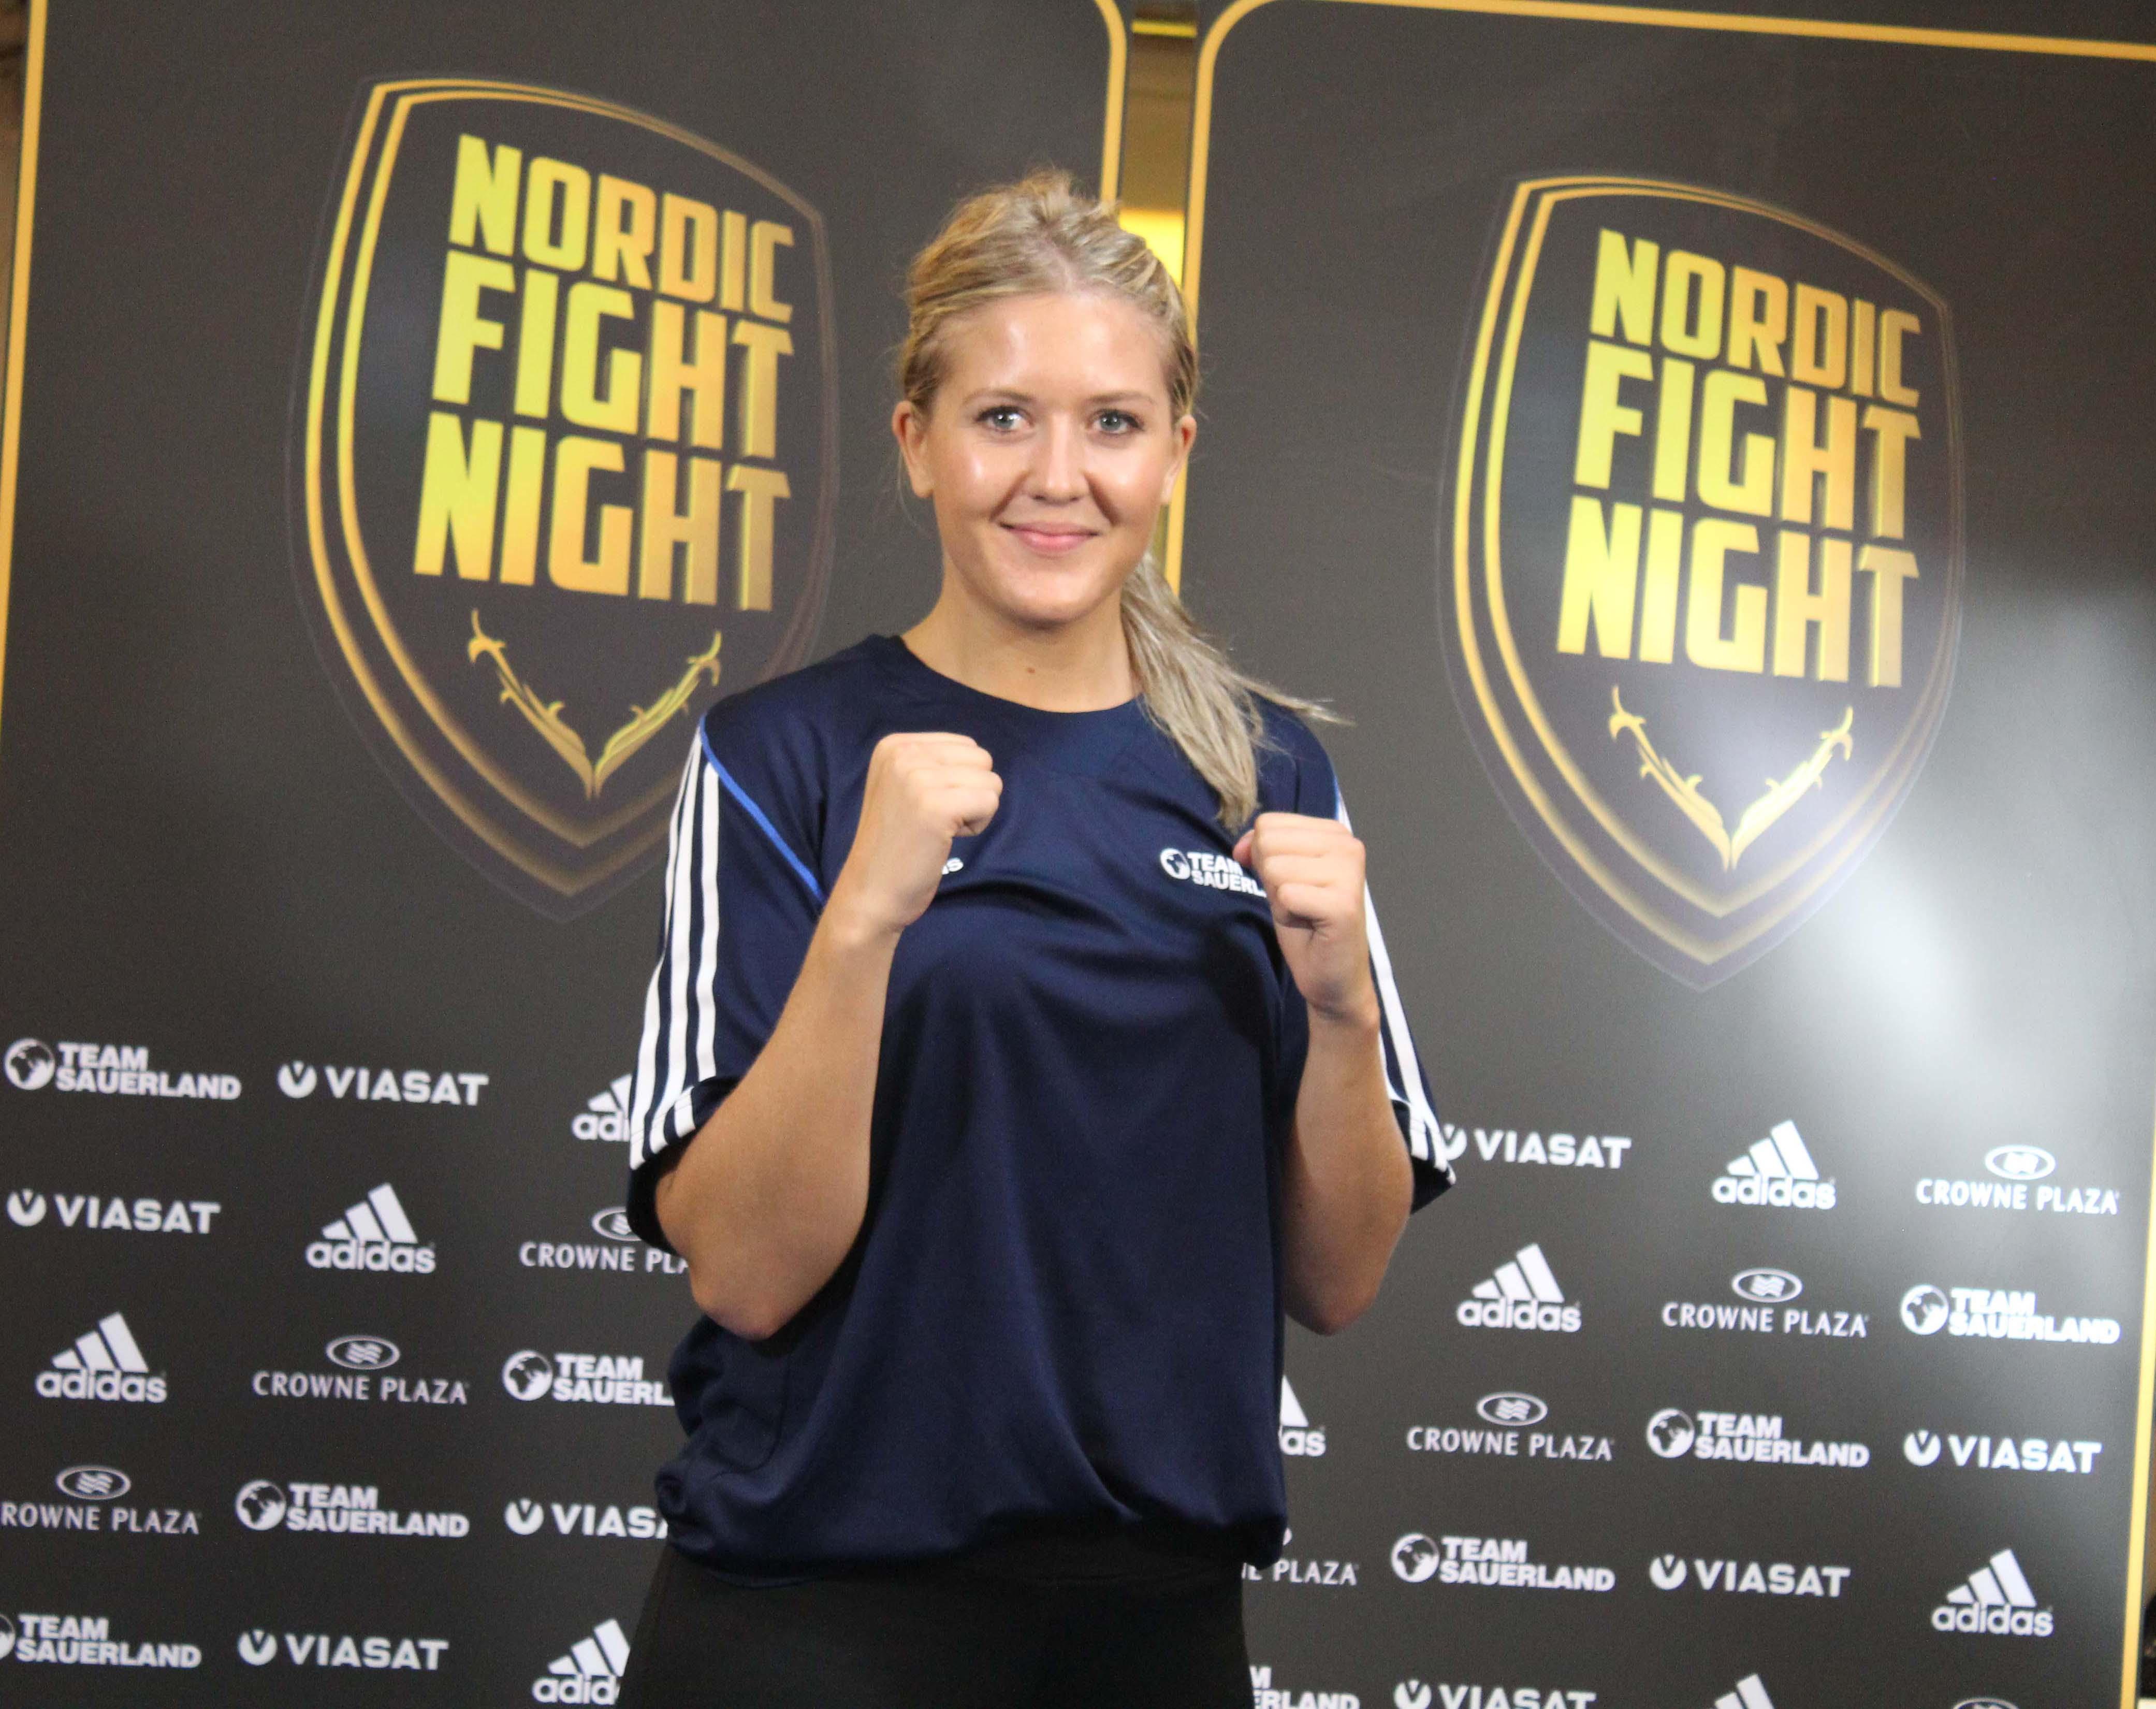 nordic fight night 2015 live stream